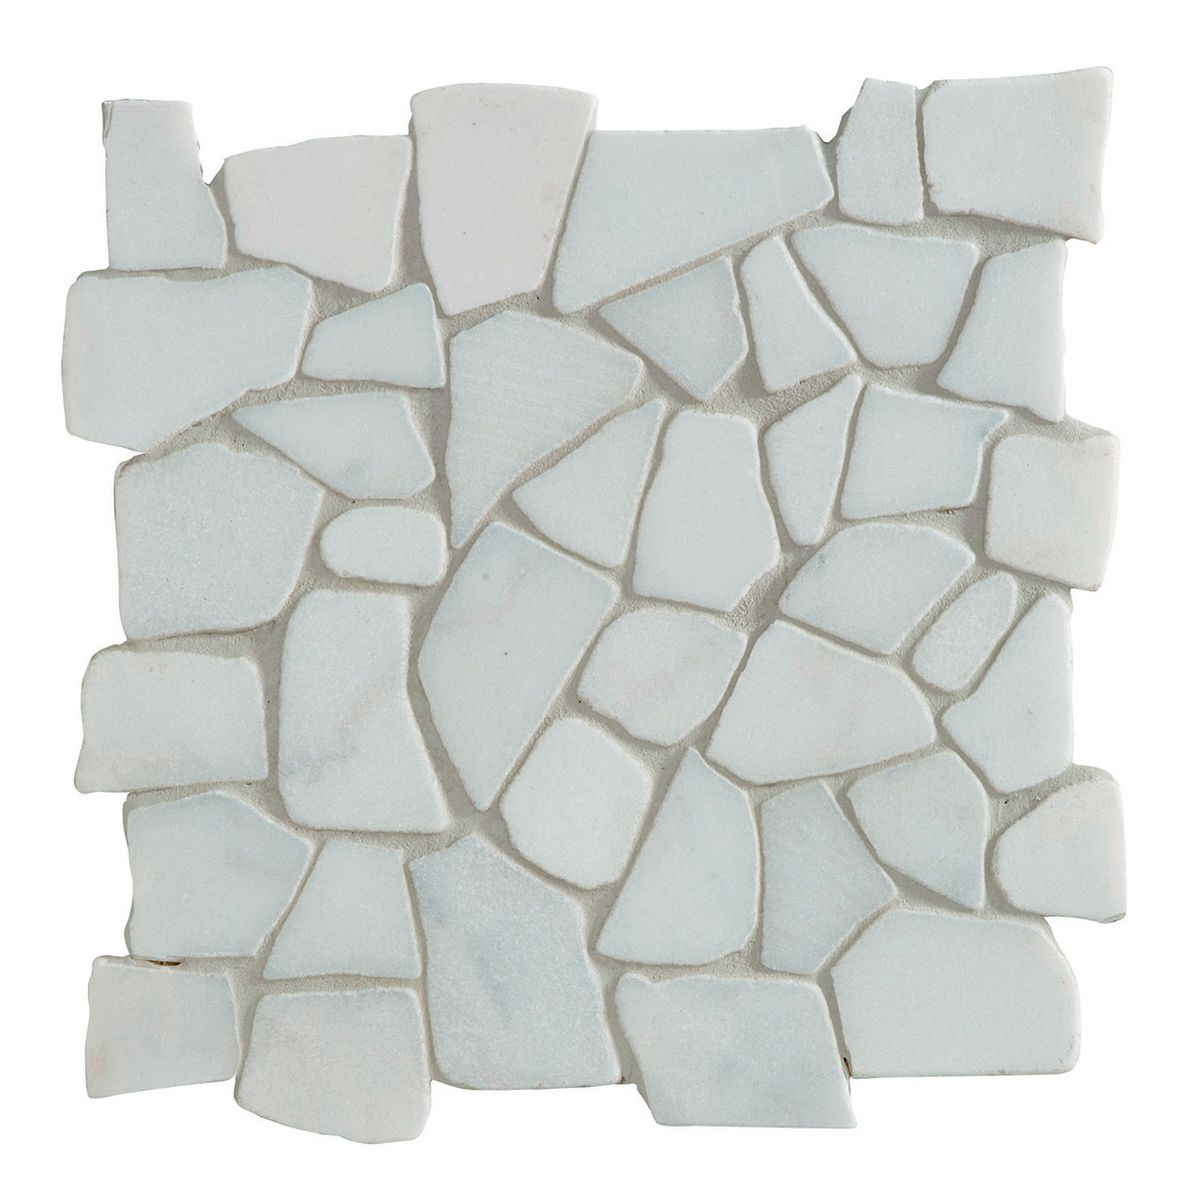 Stunning piastrelle per cucina leroy merlin ideas ideas - Leroy merlin offerte piastrelle ...